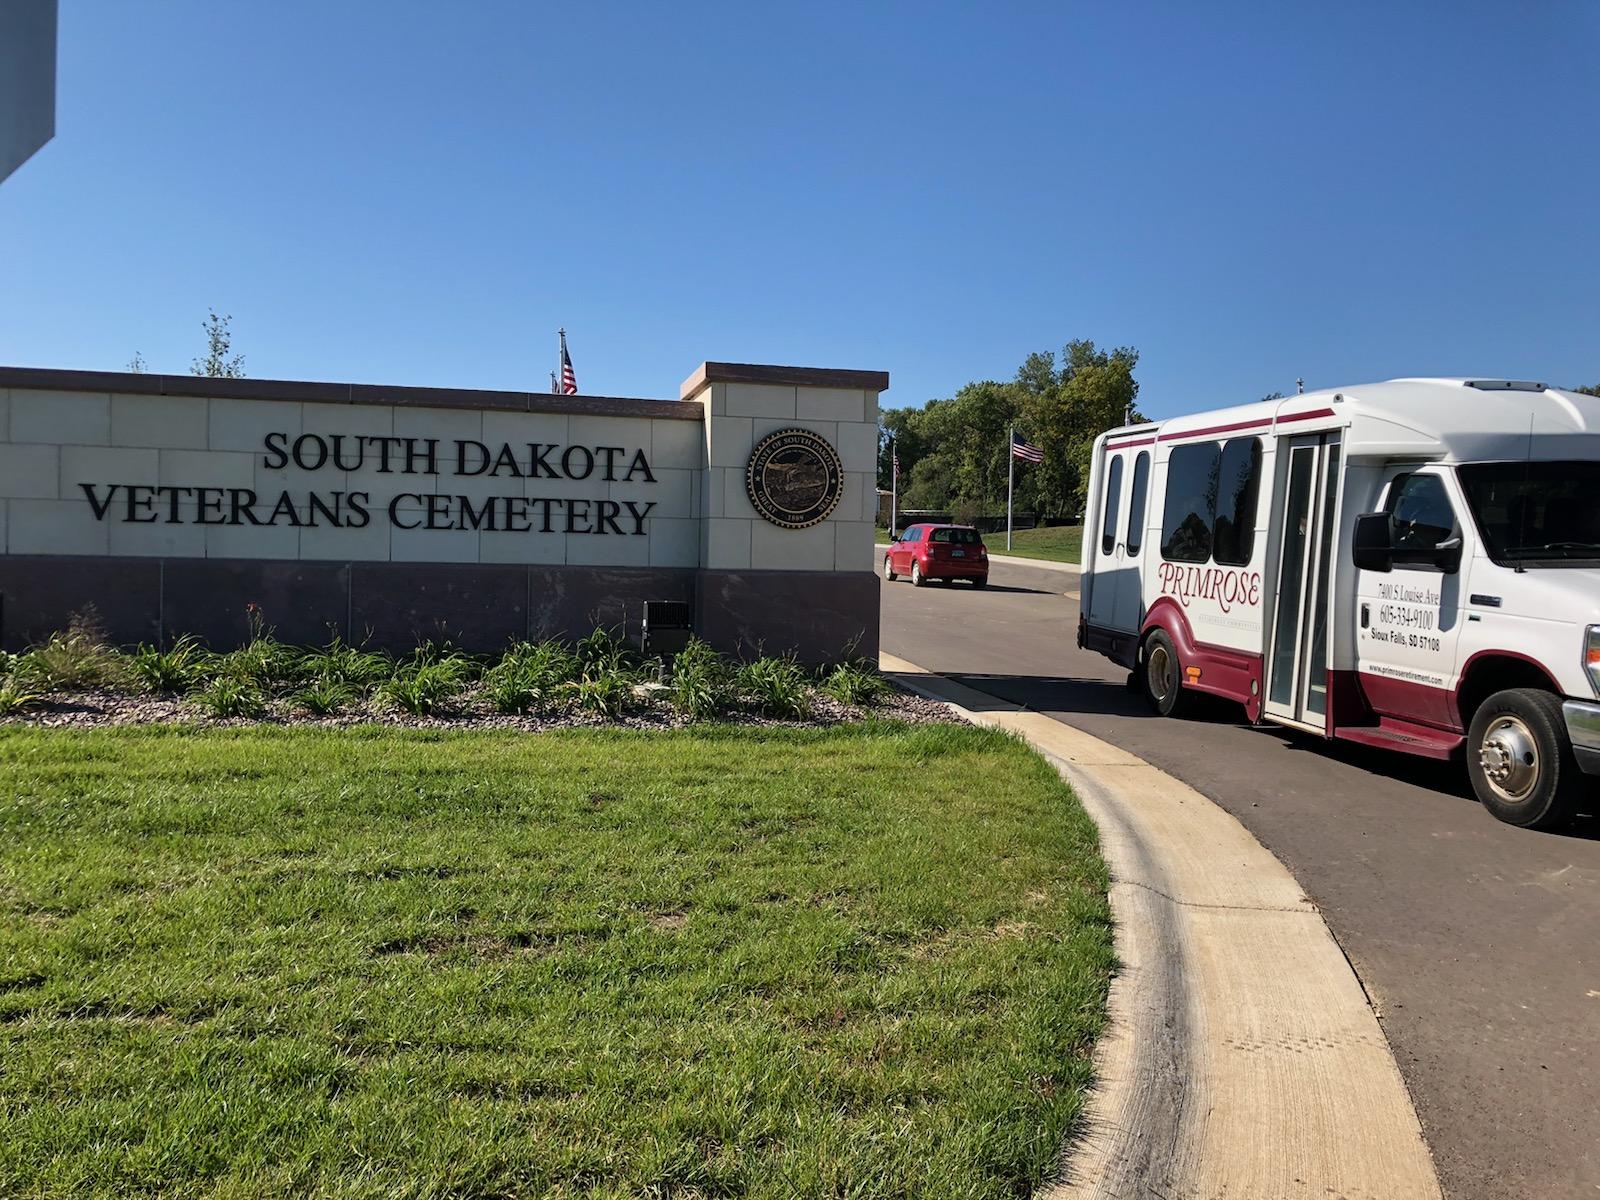 Residents take a bus tour of the South Dakota Veterans Cemetery.